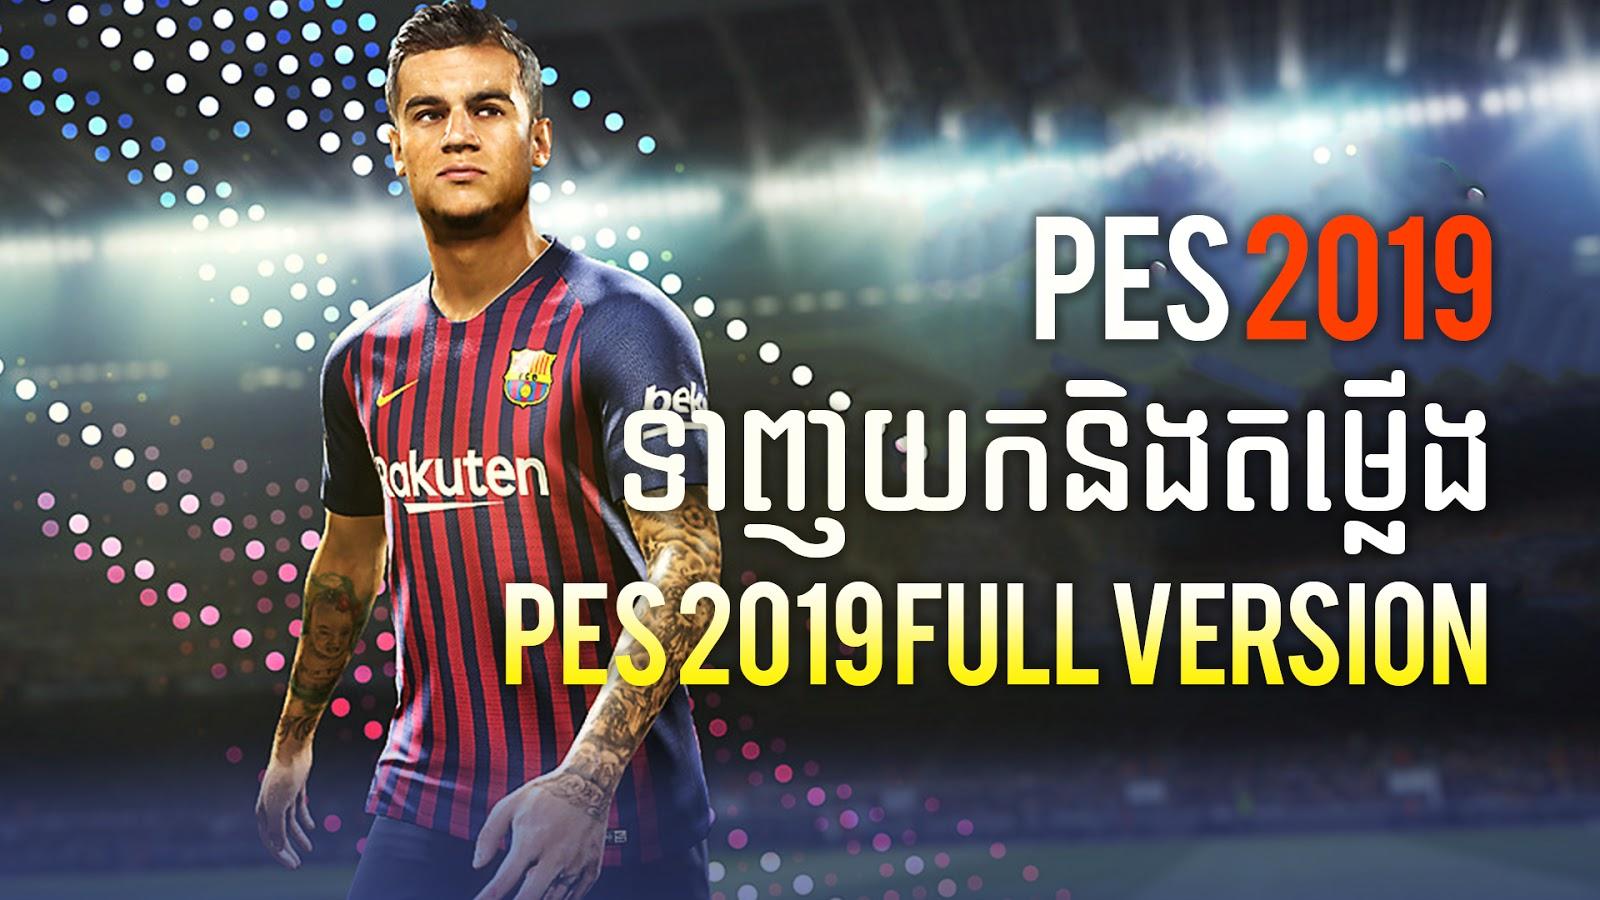 😍 Pes 2019 update download   Pes 2019 download  2019-06-16